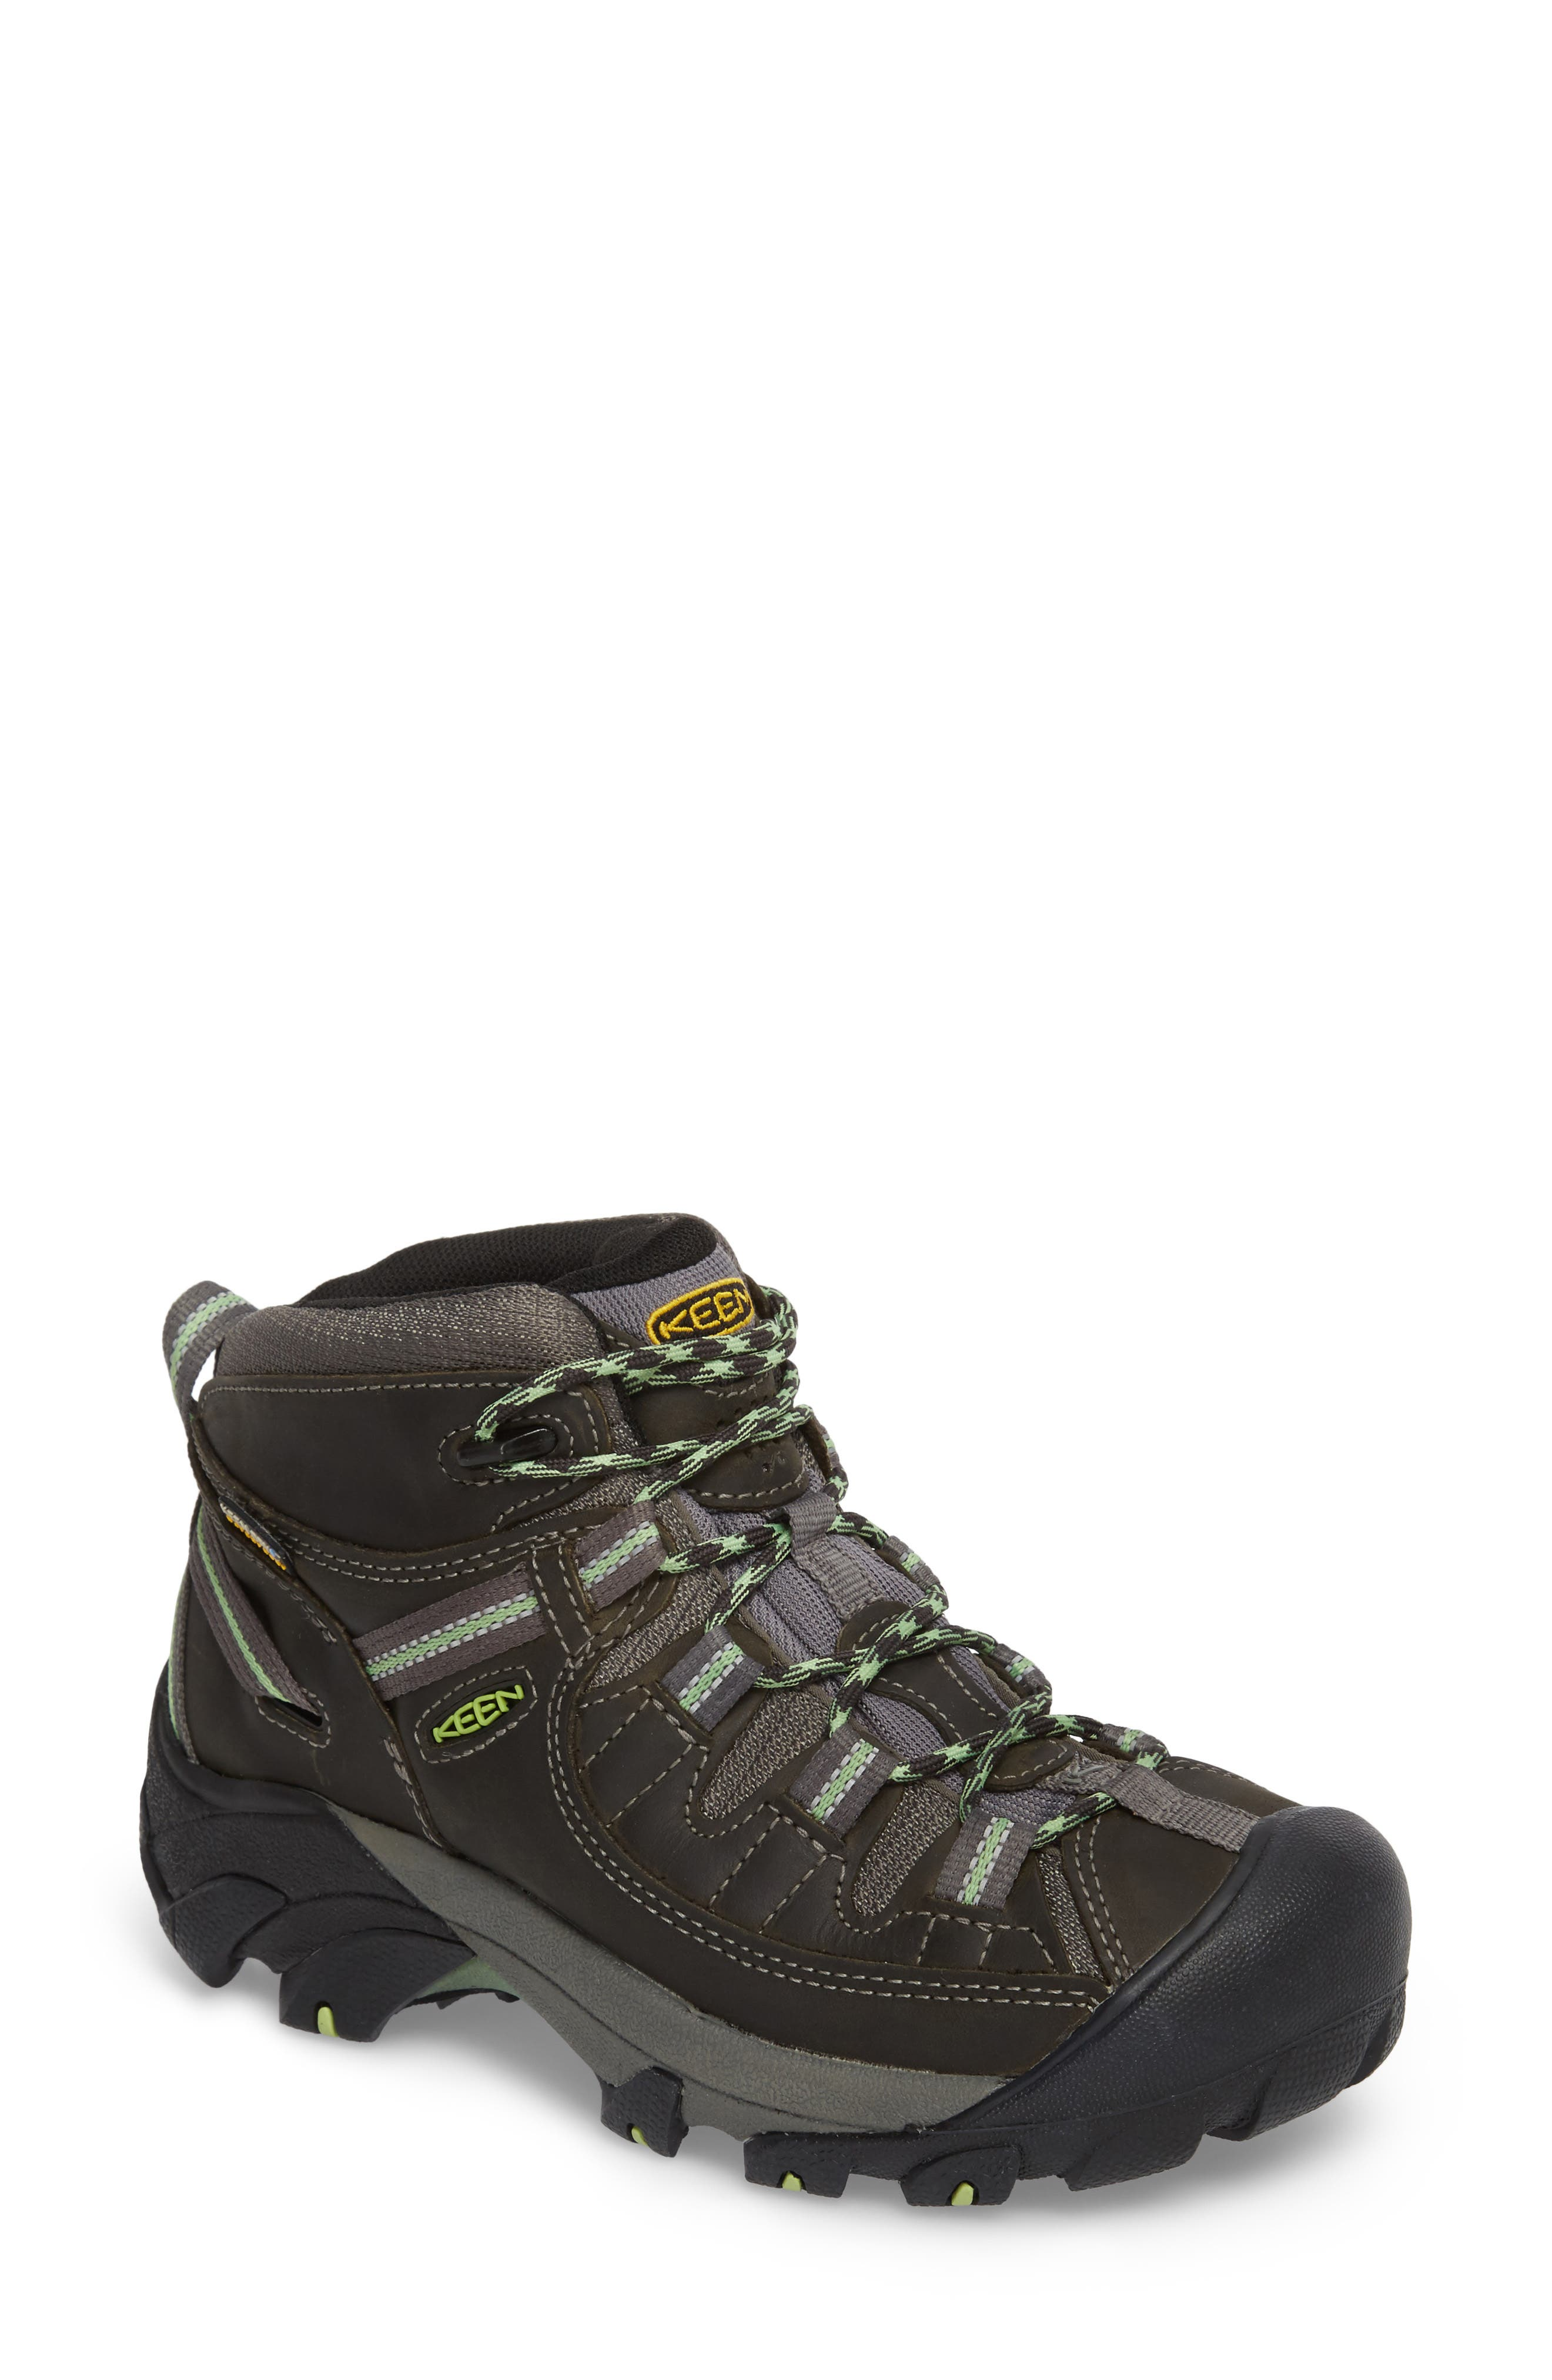 KEEN Targhee II Mid Waterproof Hiking Boot, Main, color, RAVEN/ OPALINE